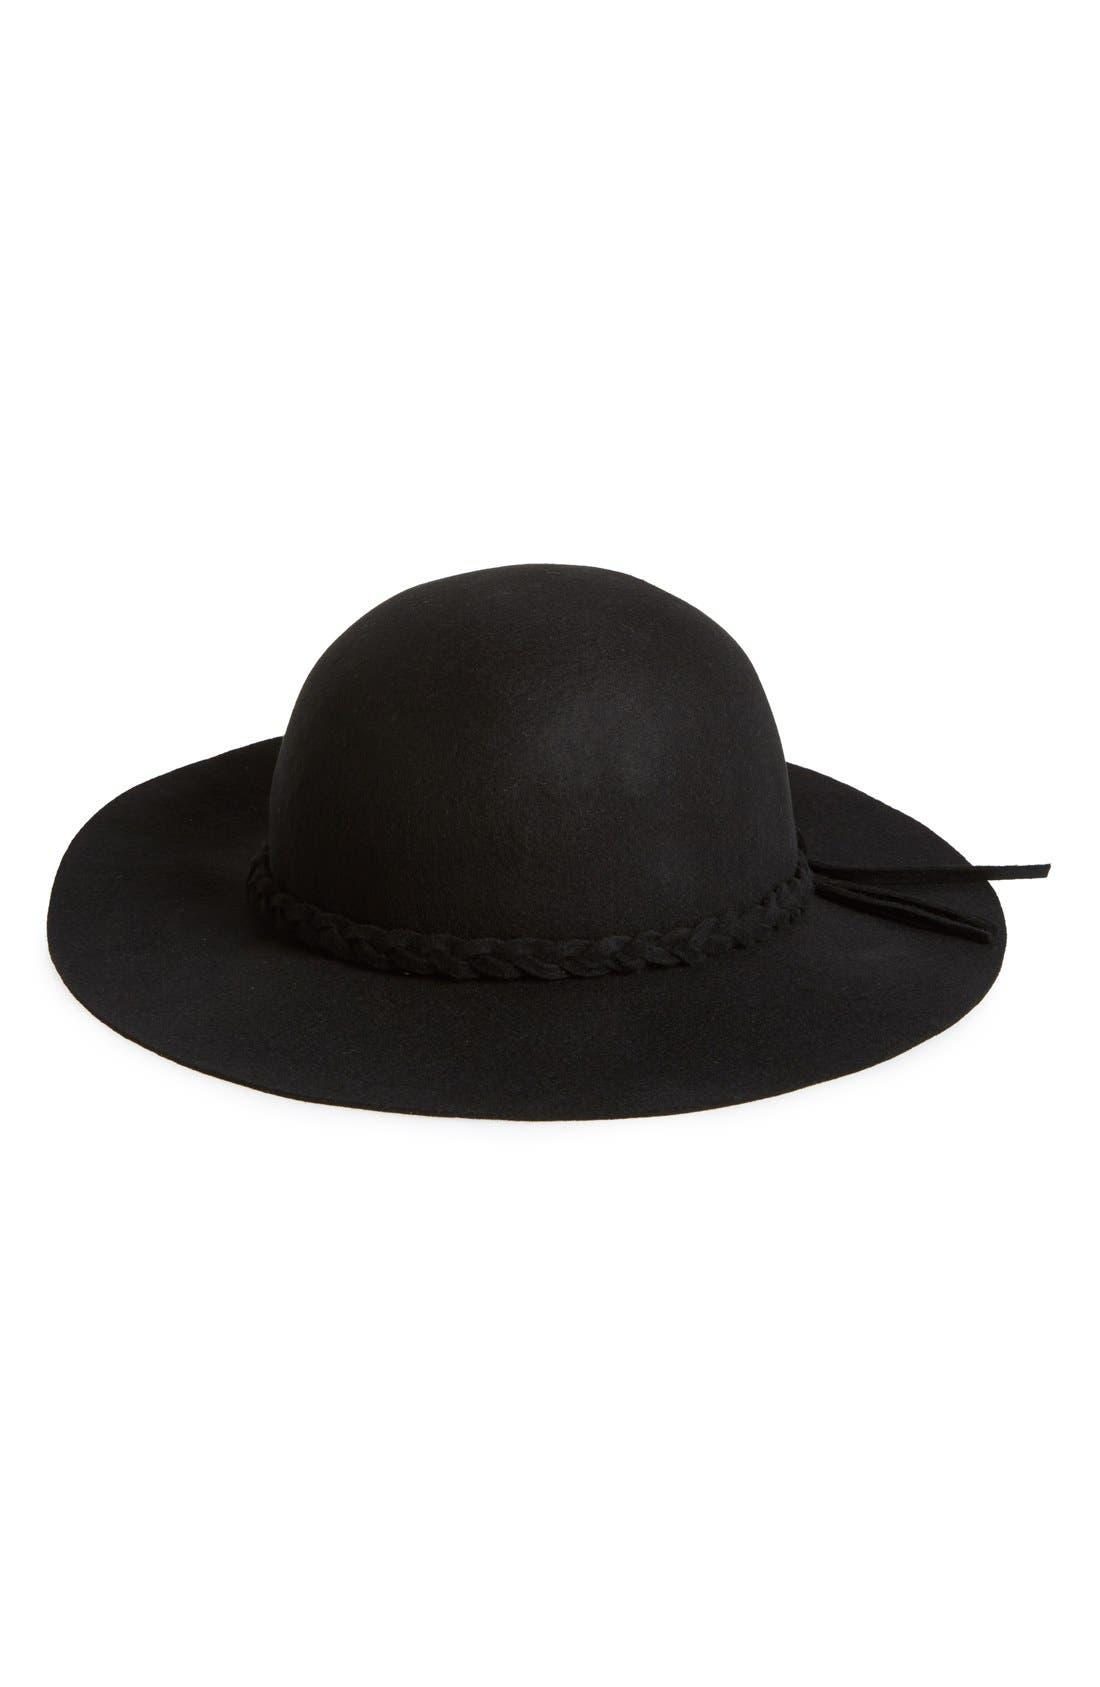 Alternate Image 1 Selected - Lulu Floppy Felt Hat